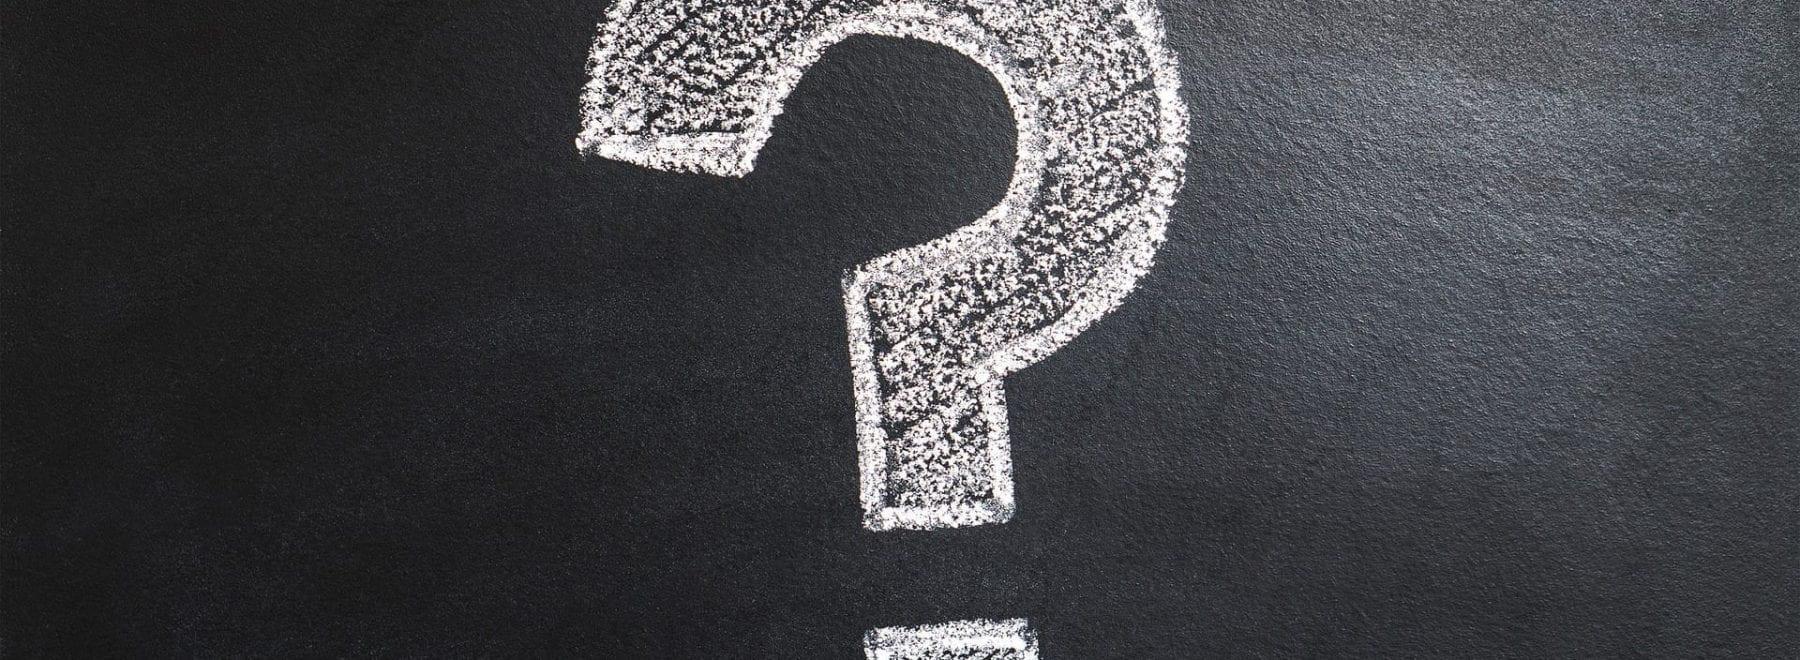 question mark on a chalk board